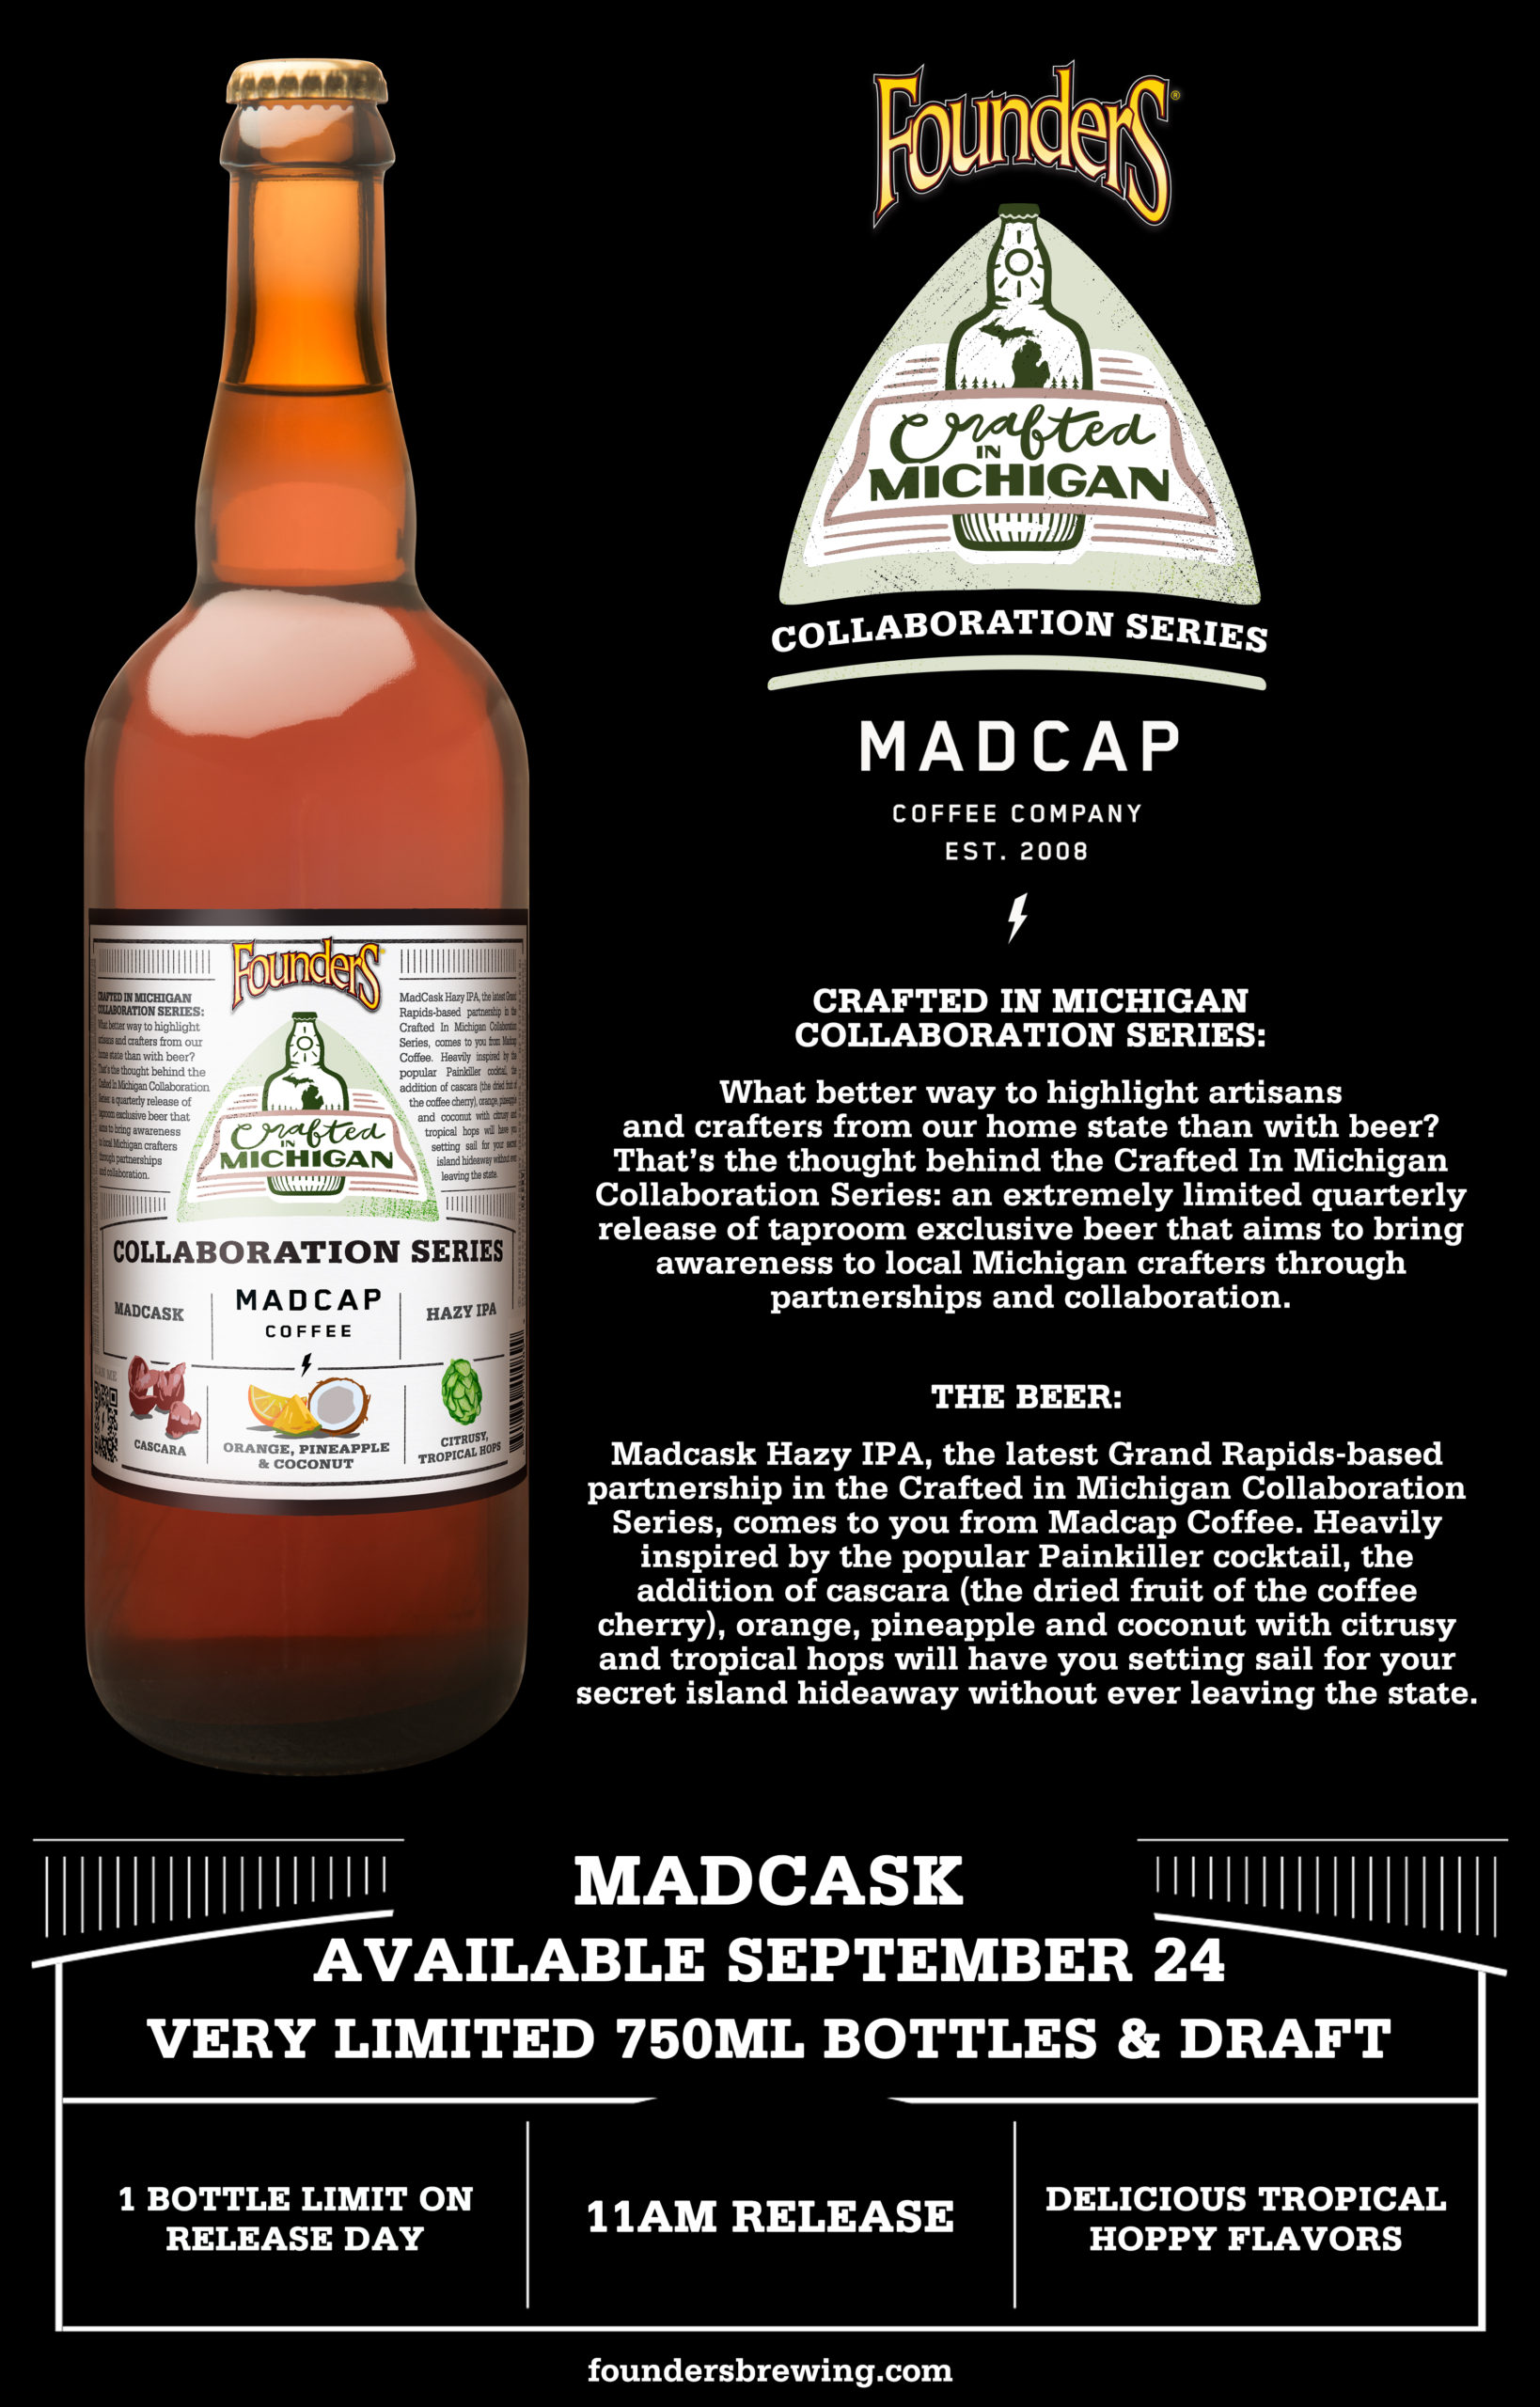 Madcask Detroit release on September 24 at 11am